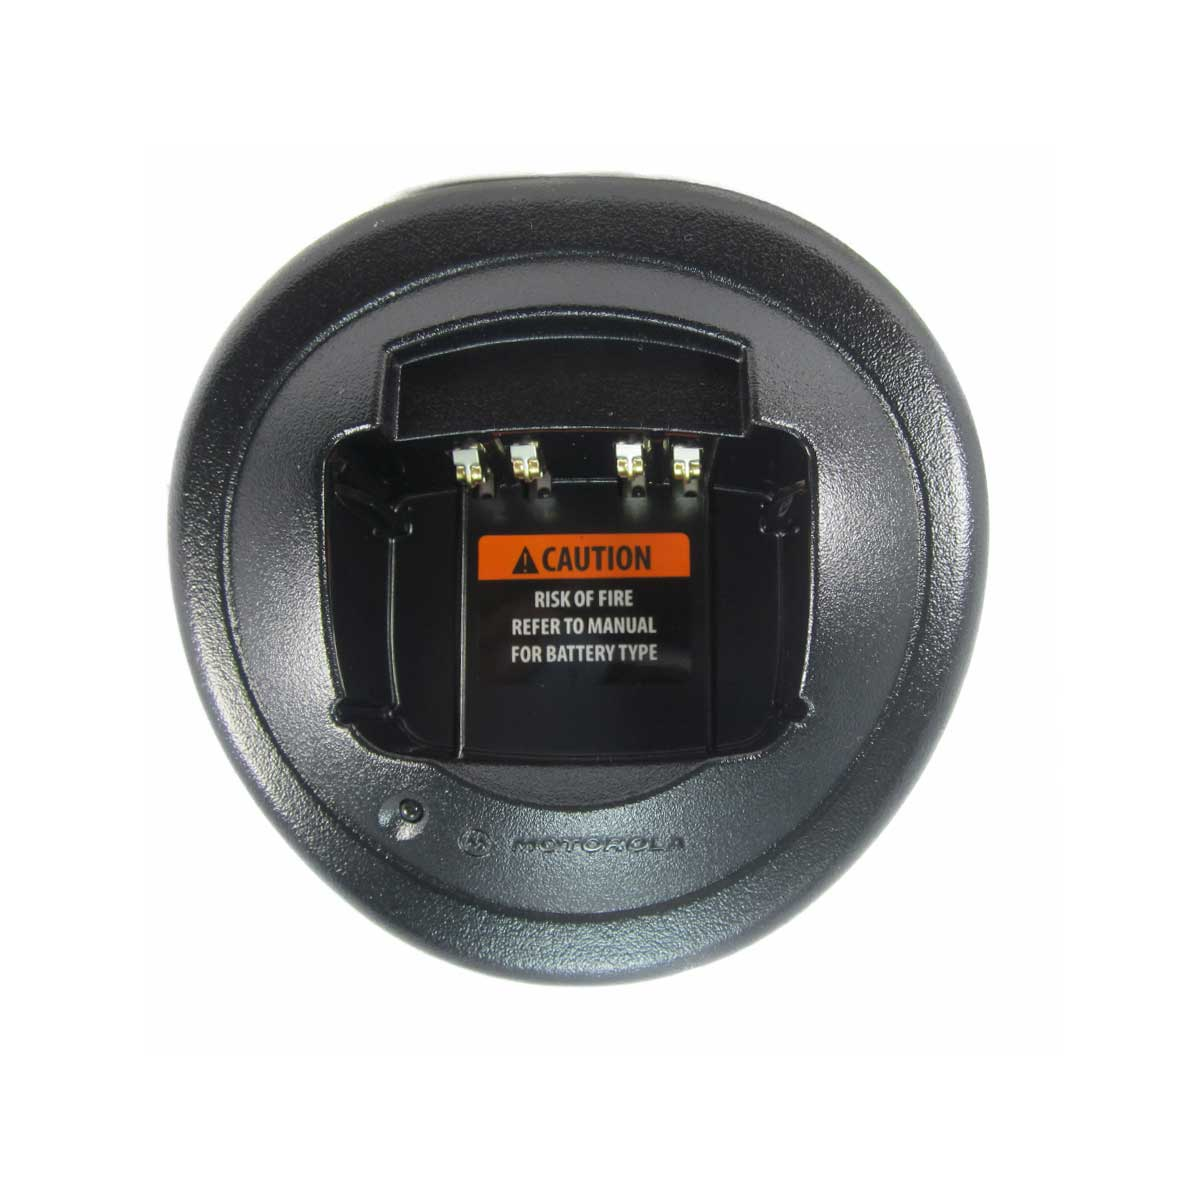 Cargador individual Motorola AAHTN3000 para radios serie PRO